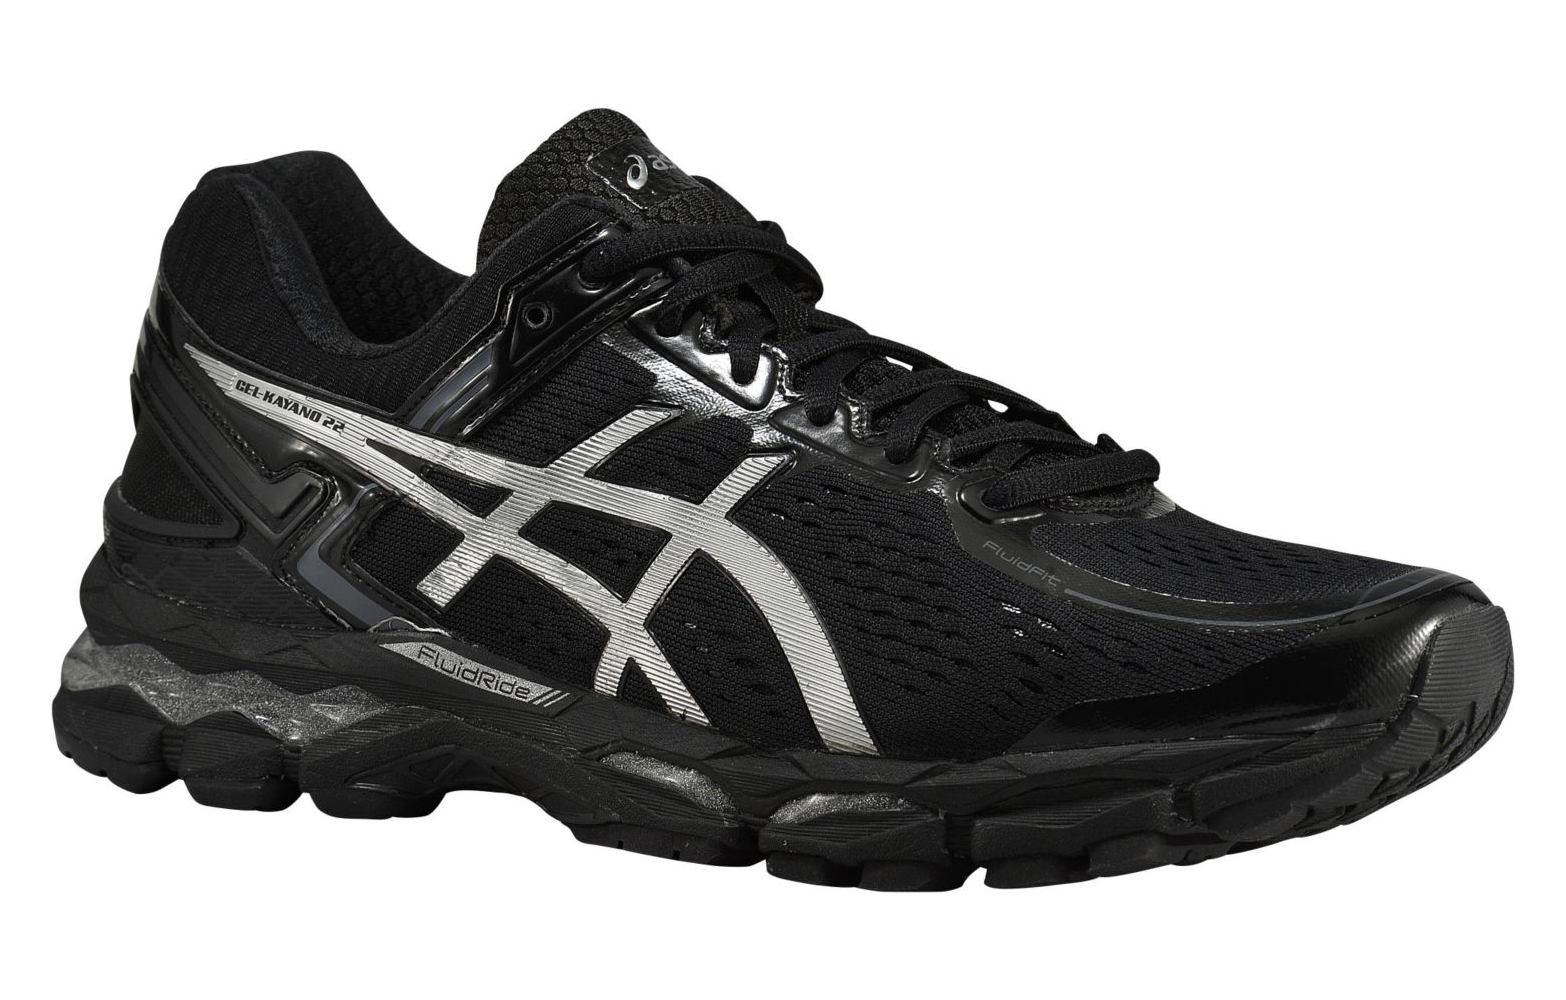 Chaussures Running Asics Gel Kayano 22 taille 47 48